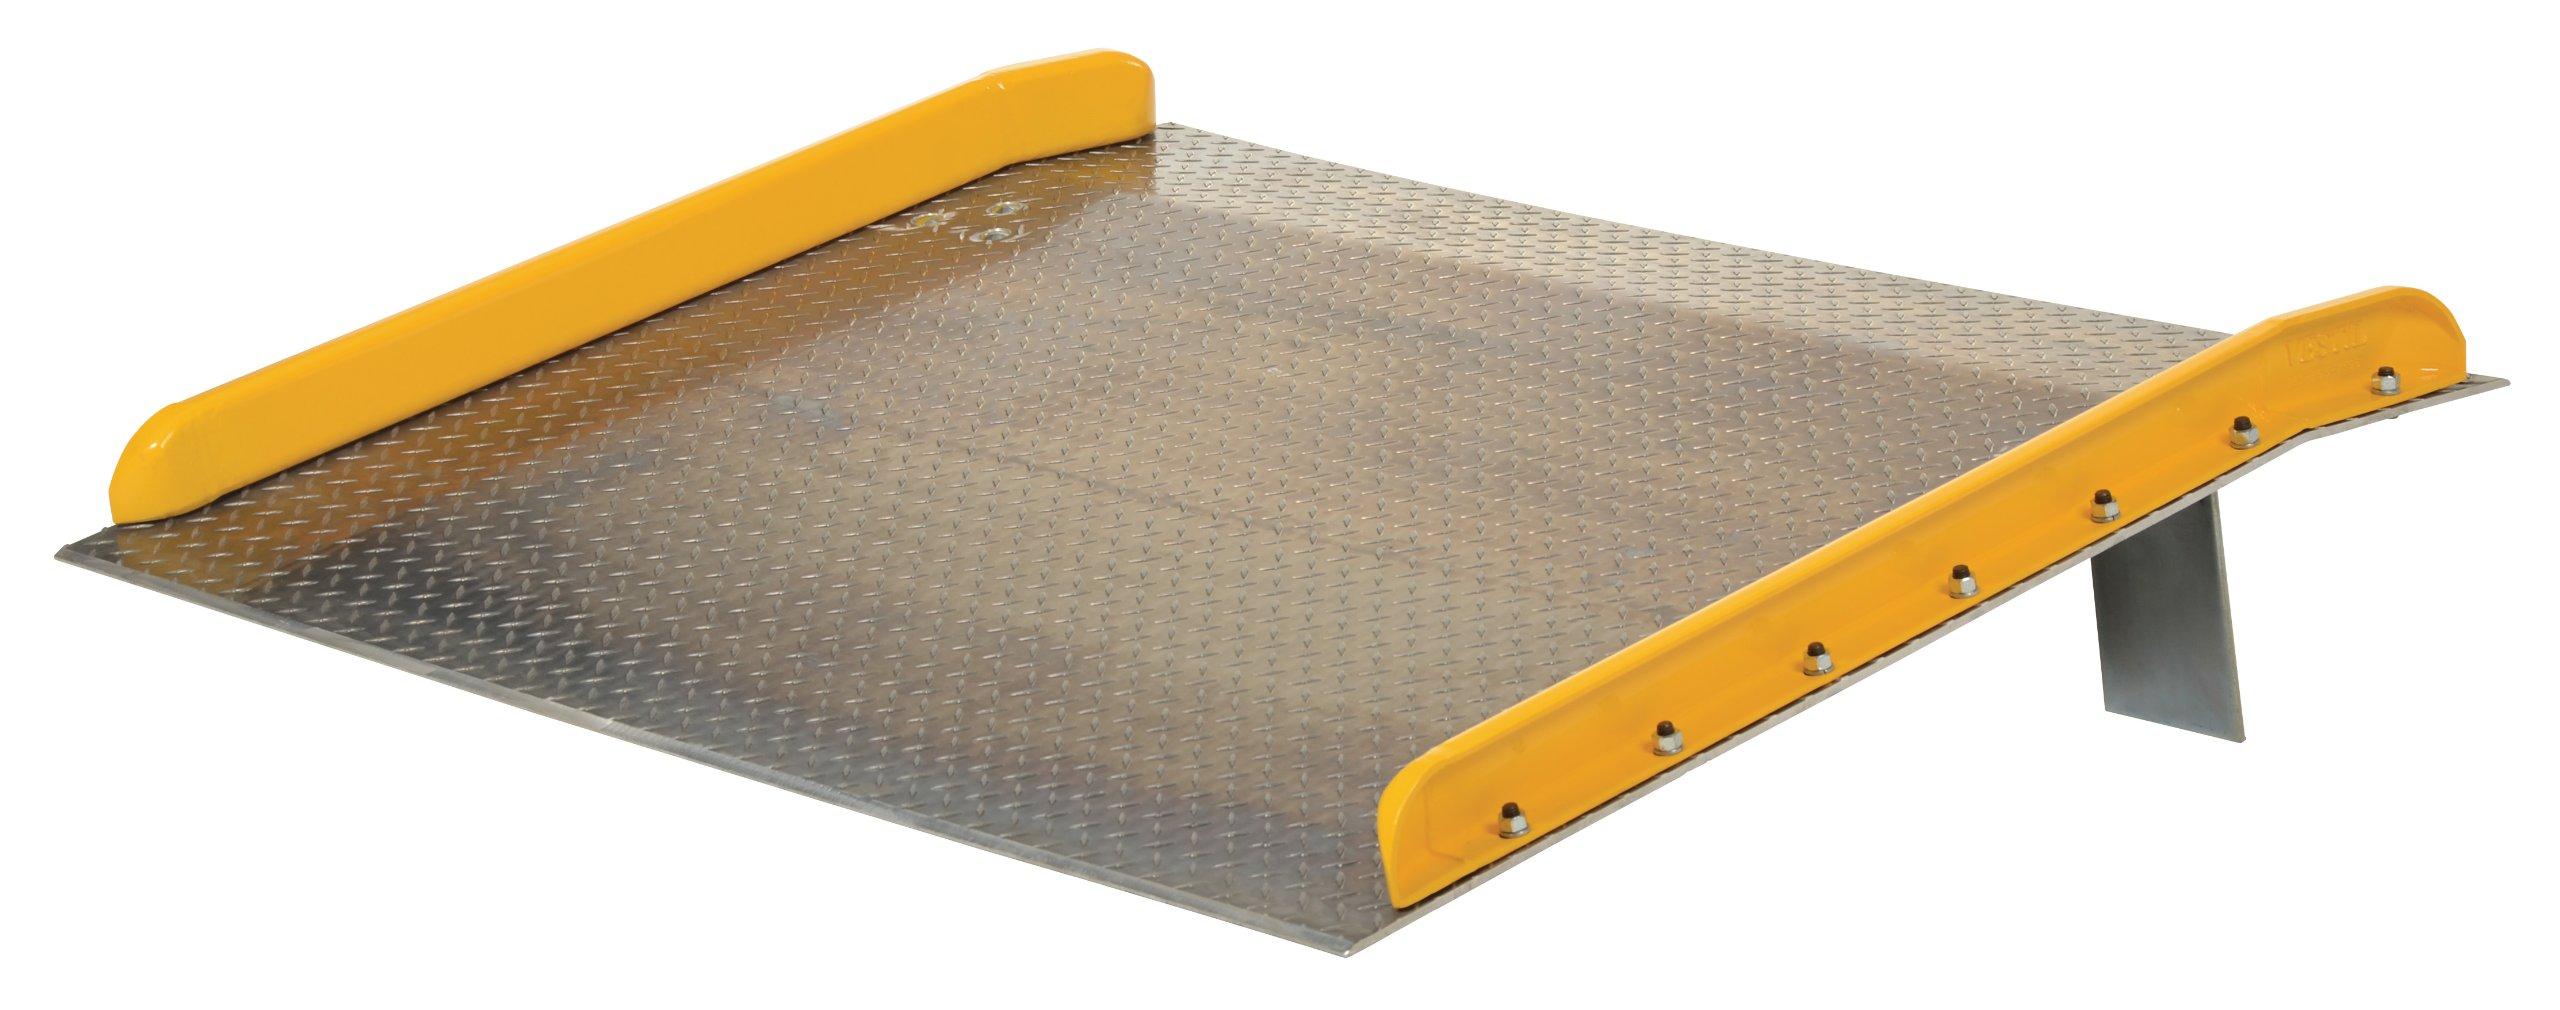 Vestil TAS-20-7260 Aluminum Dock Board with Steel Curb, 20000 lb. Capacity, 72'' x 60'', Silver